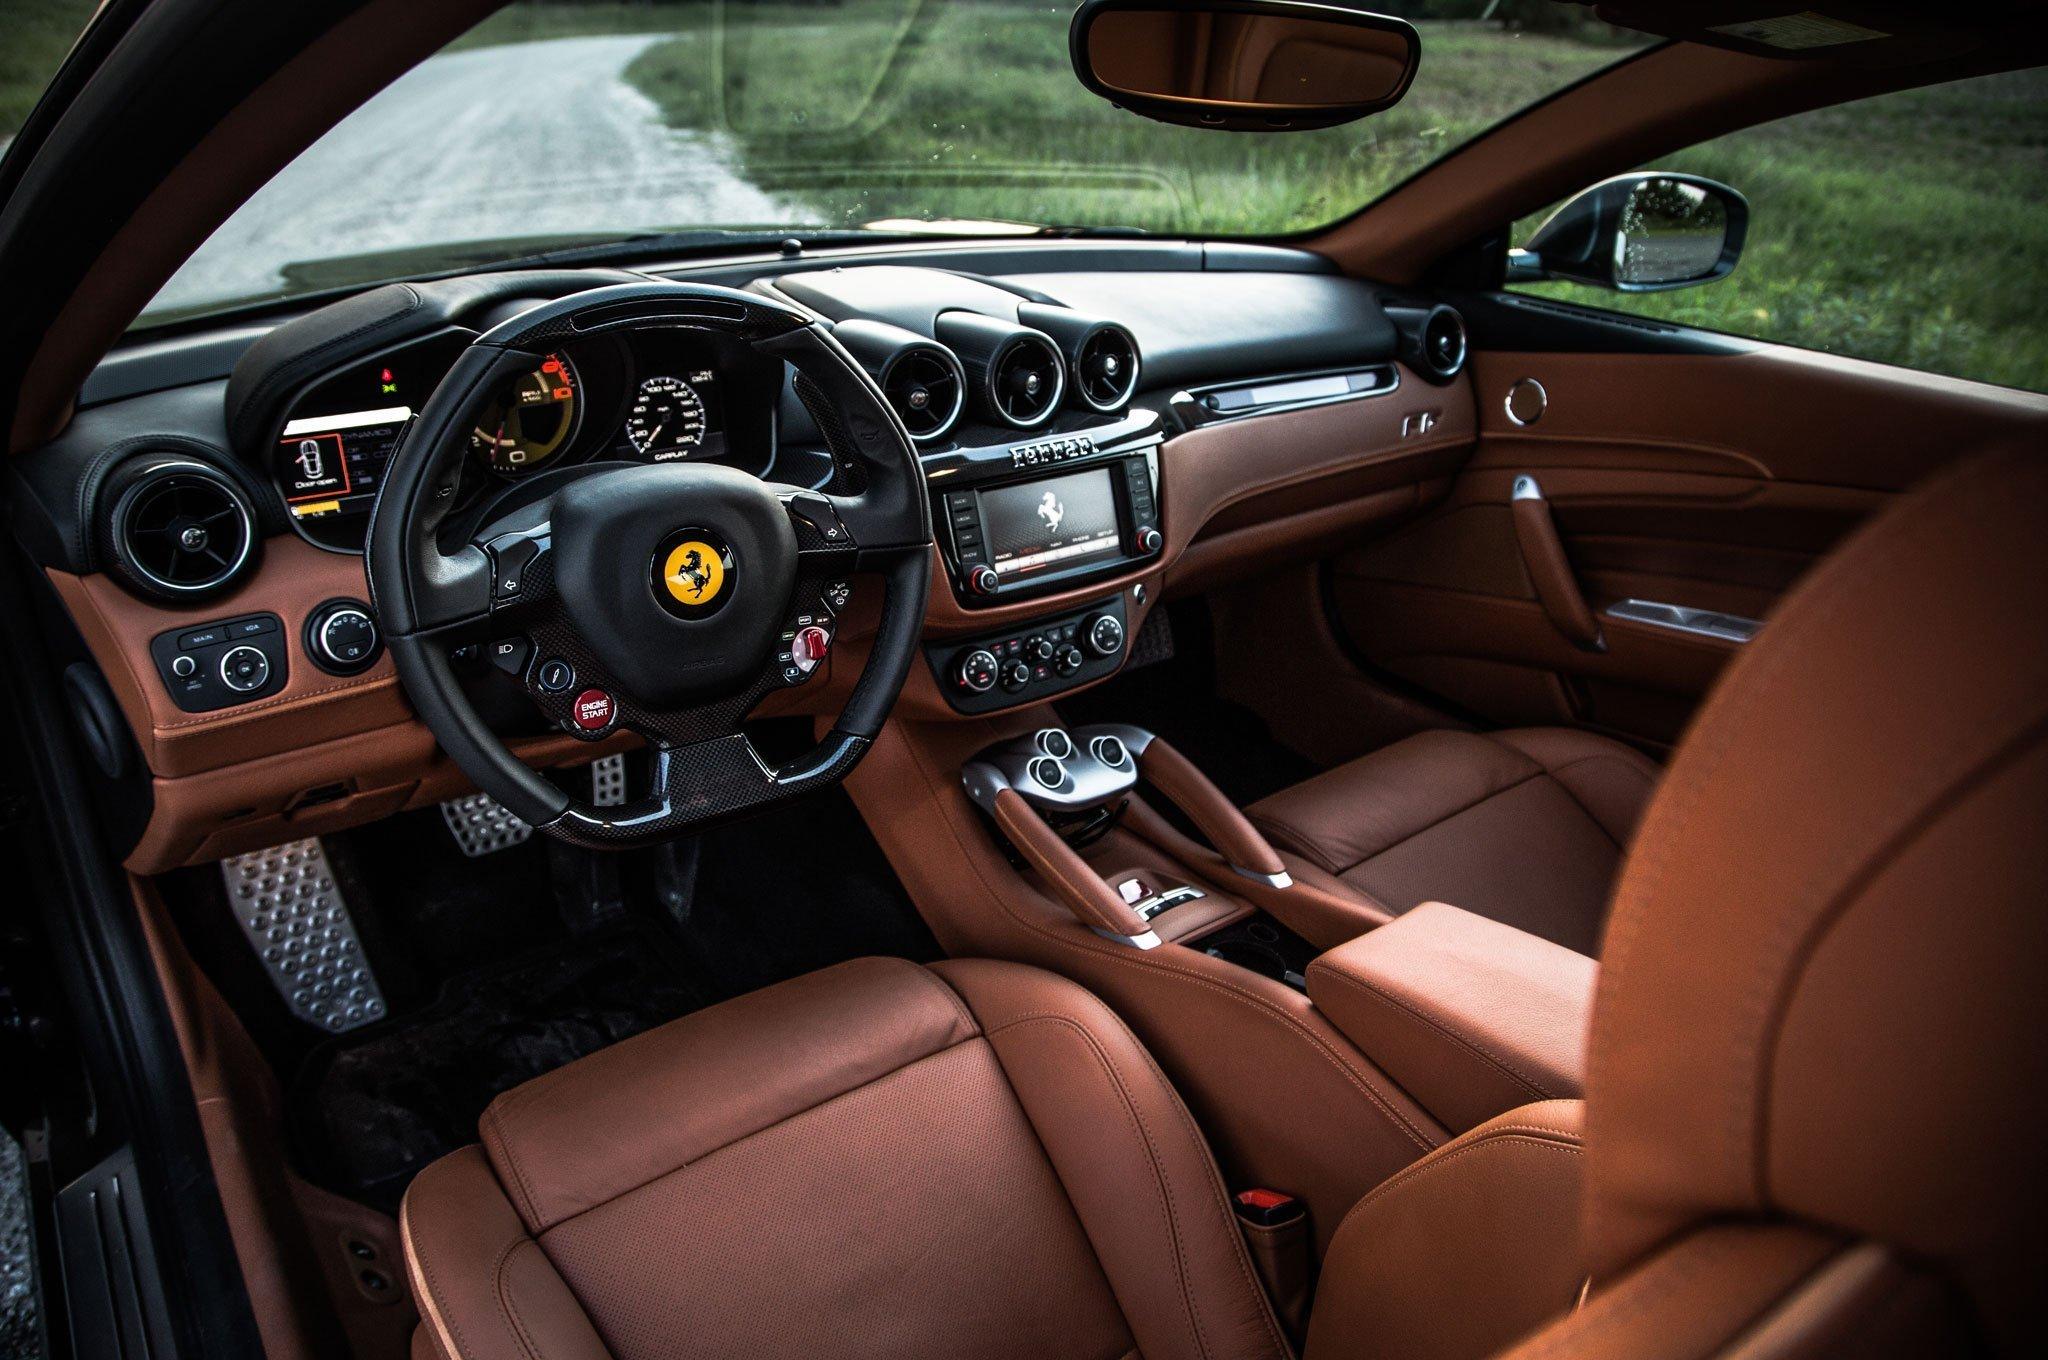 Ferrari FF is a grand tourer presented by Italian automobile manufacturer Ferrari on March 1, 2011.